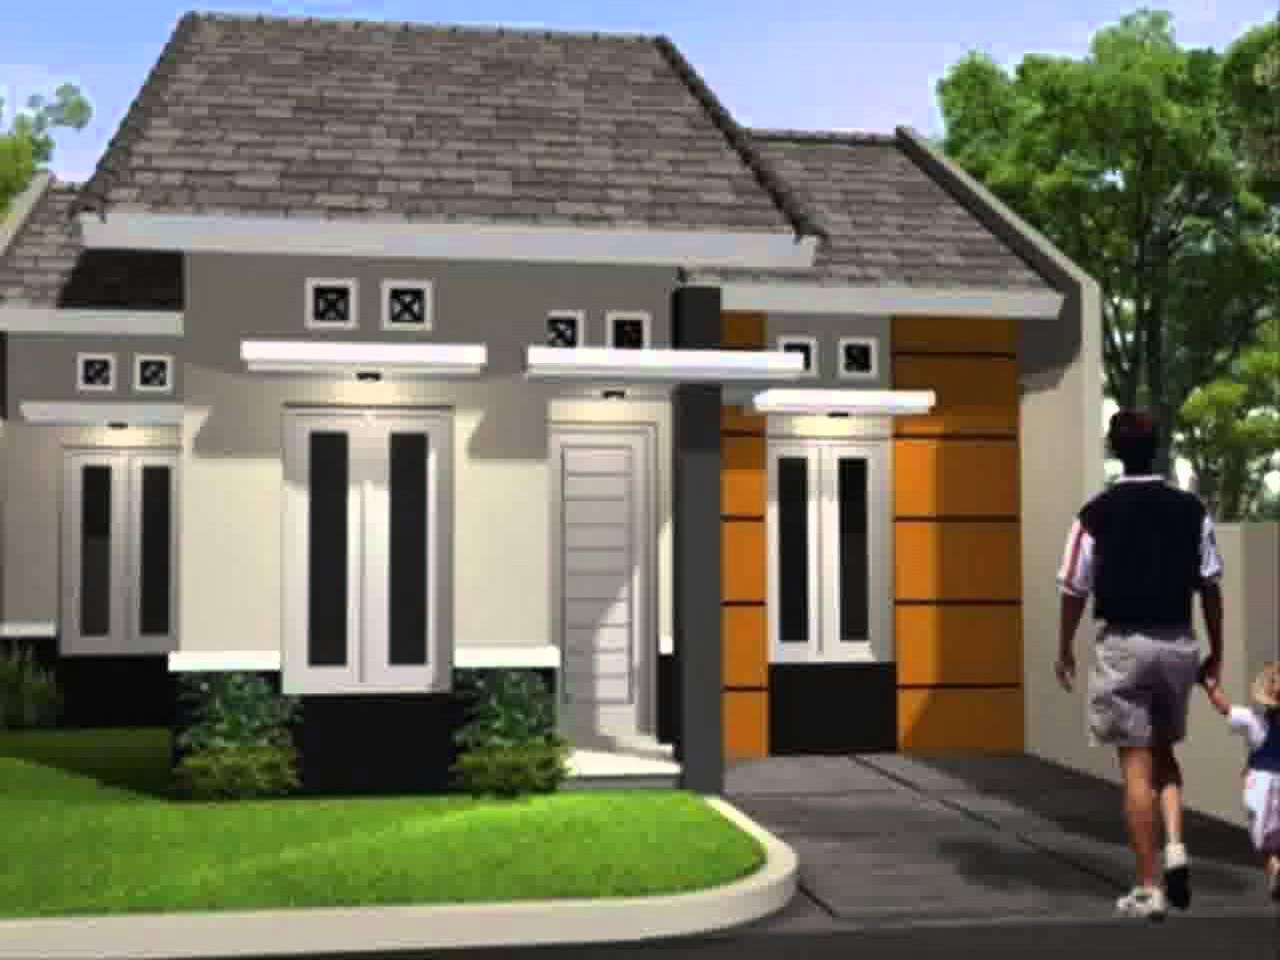 67 Desain Rumah Minimalis 6 X 9 Desain Rumah Minimalis Terbaru Seon One Stop Solution